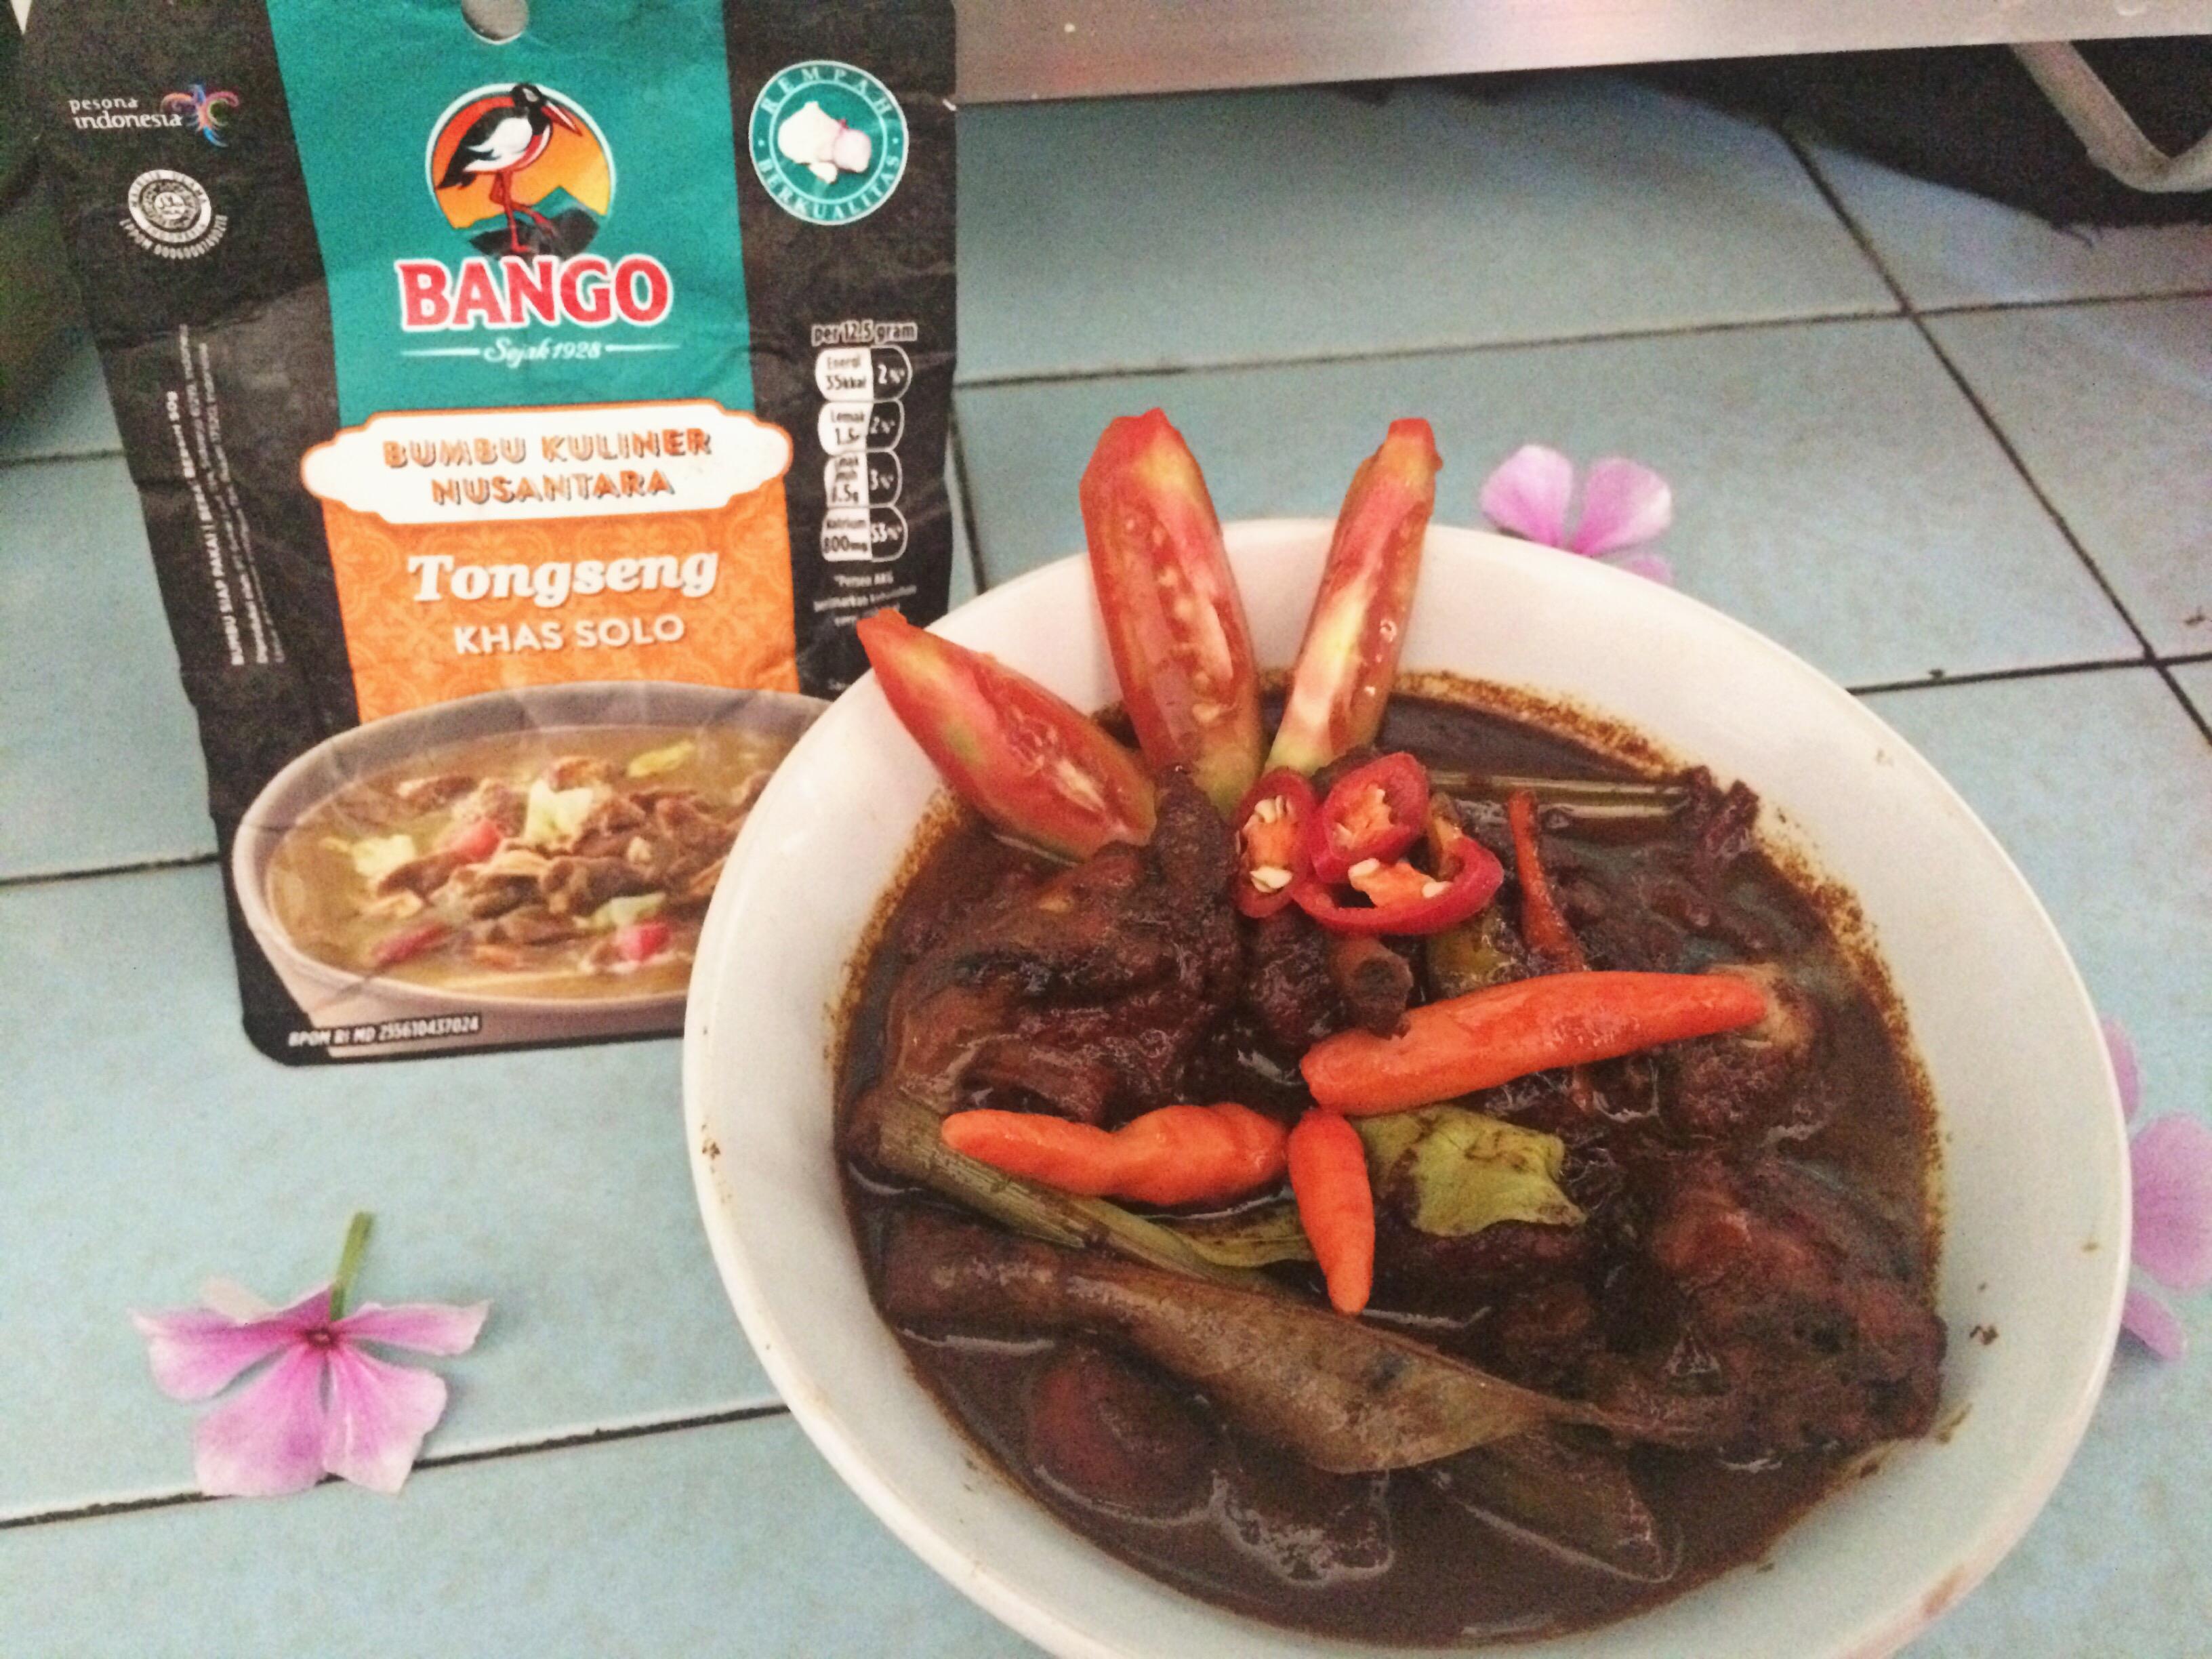 image review Bango Bumbu Kuliner Nusantara - Tongseng